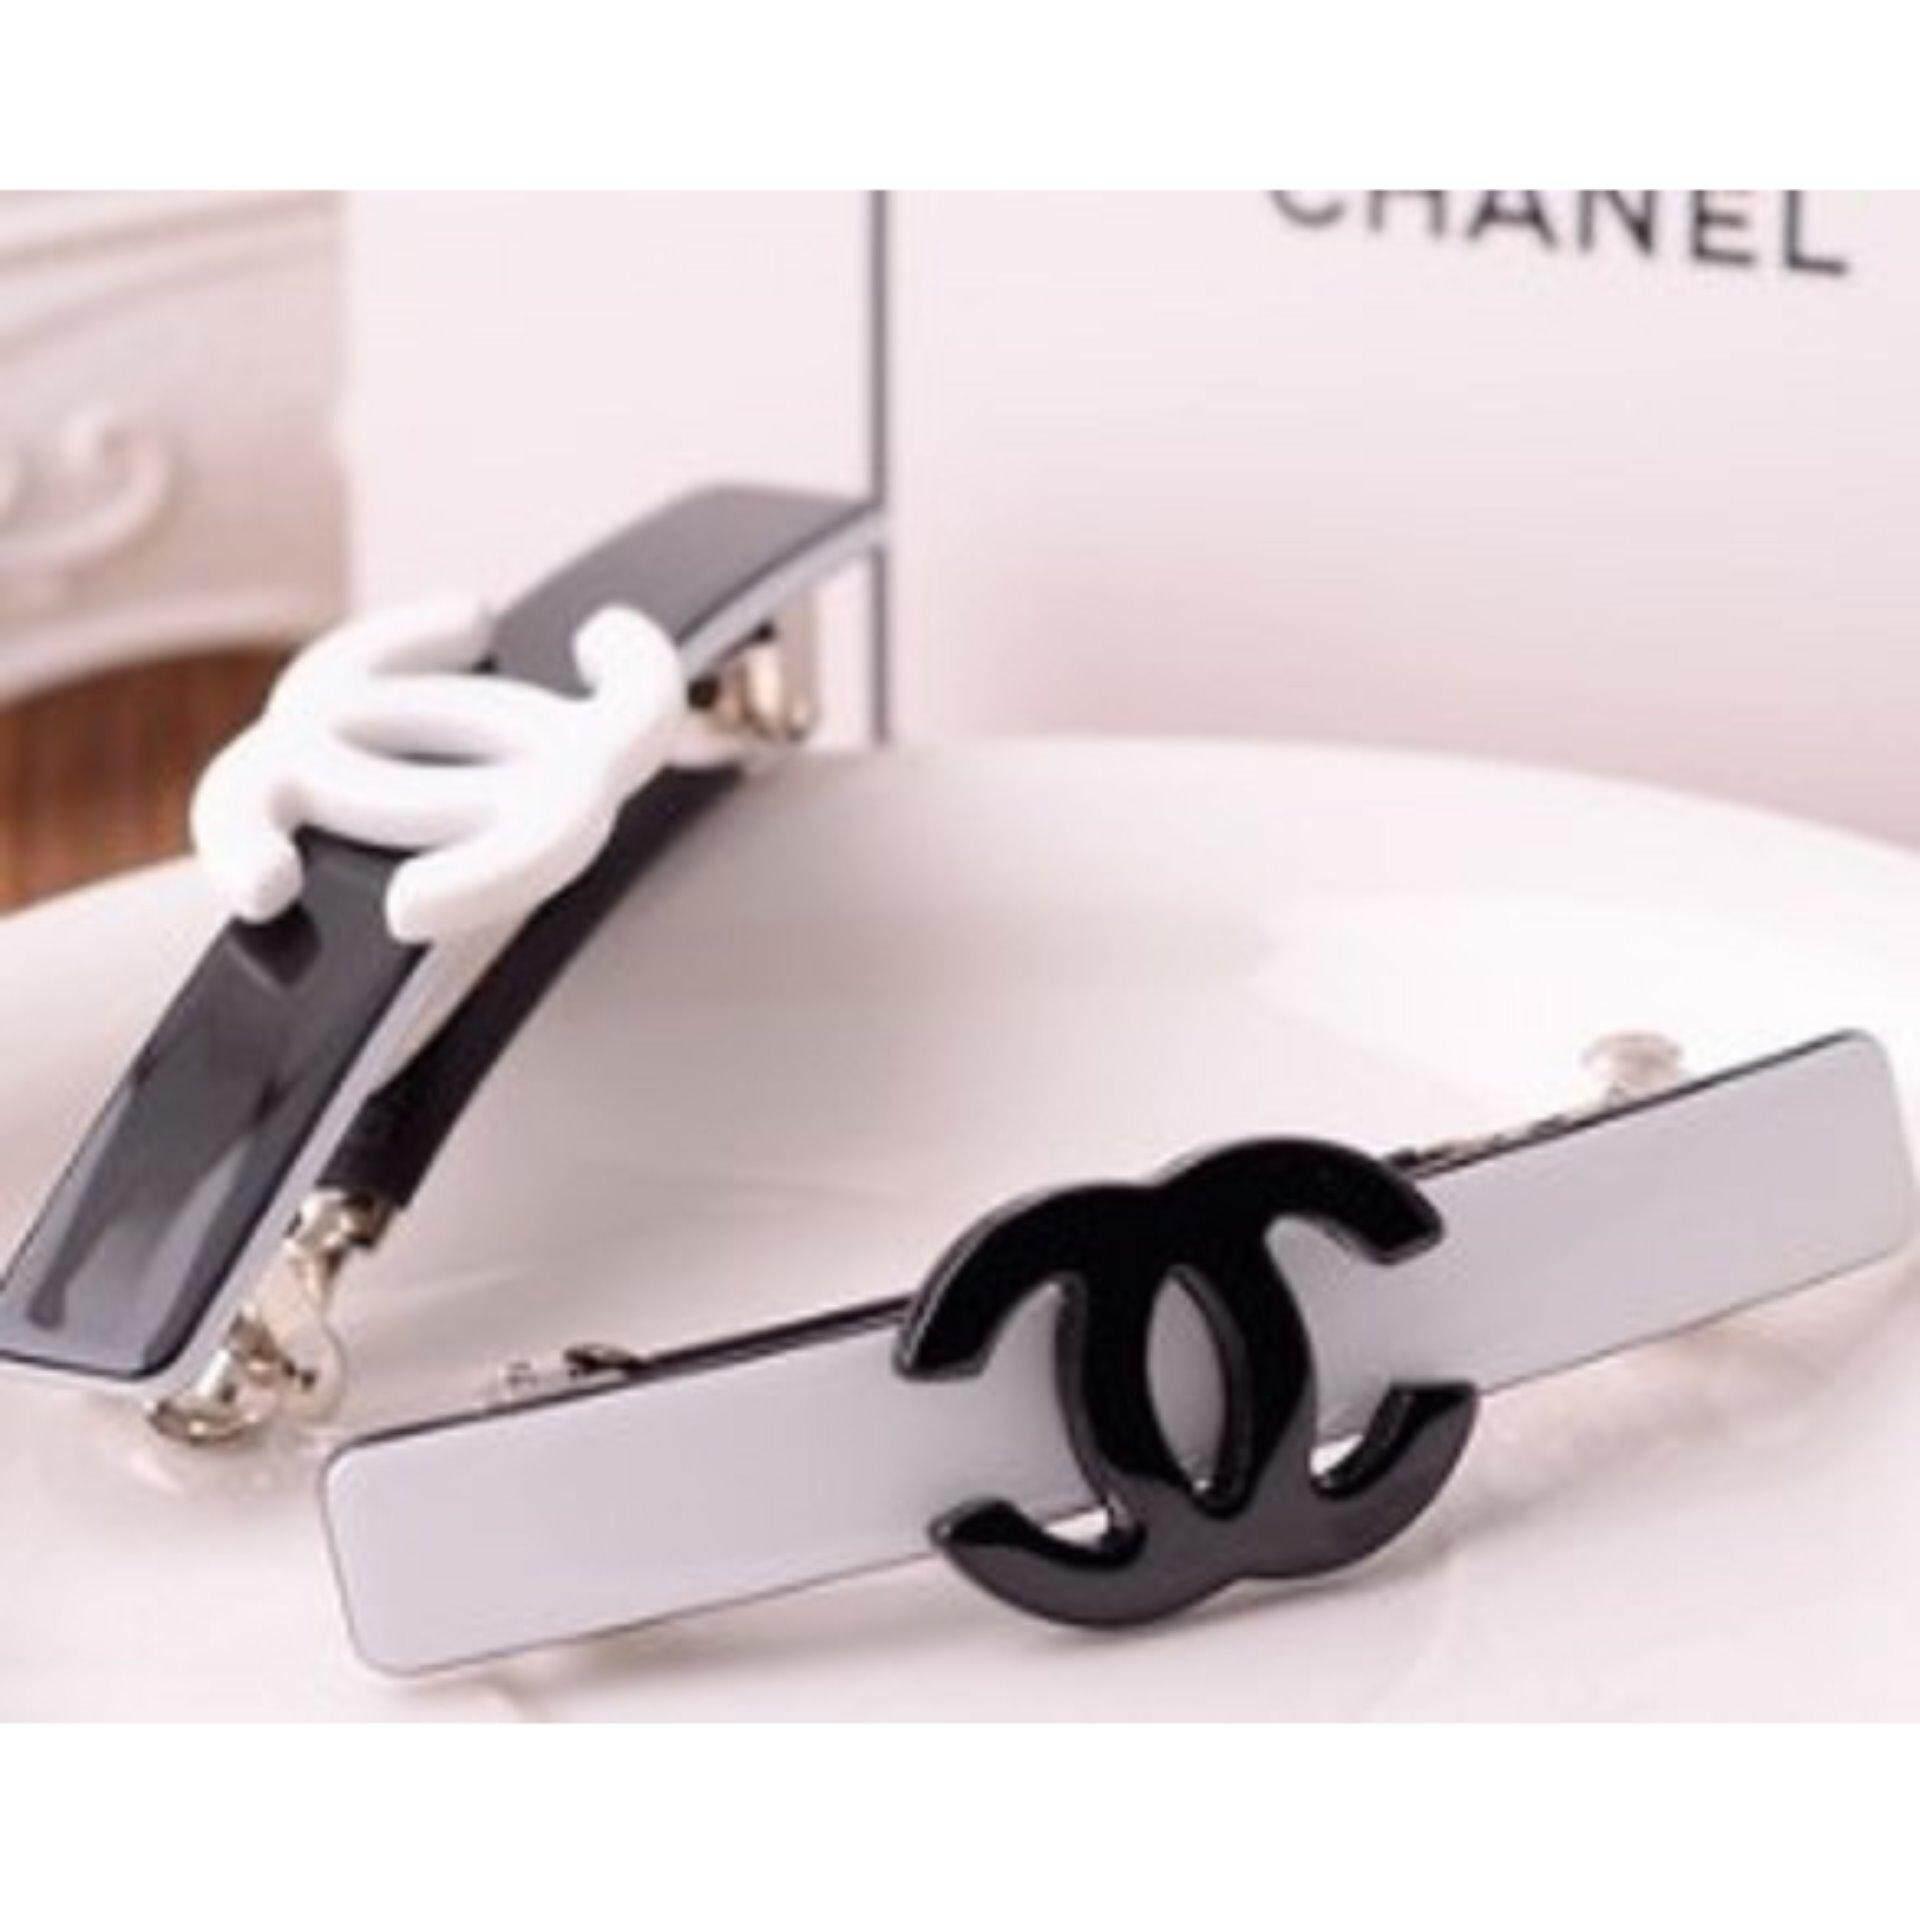 Authentic Chanel VIP Hair Clip- Very rare (Black)